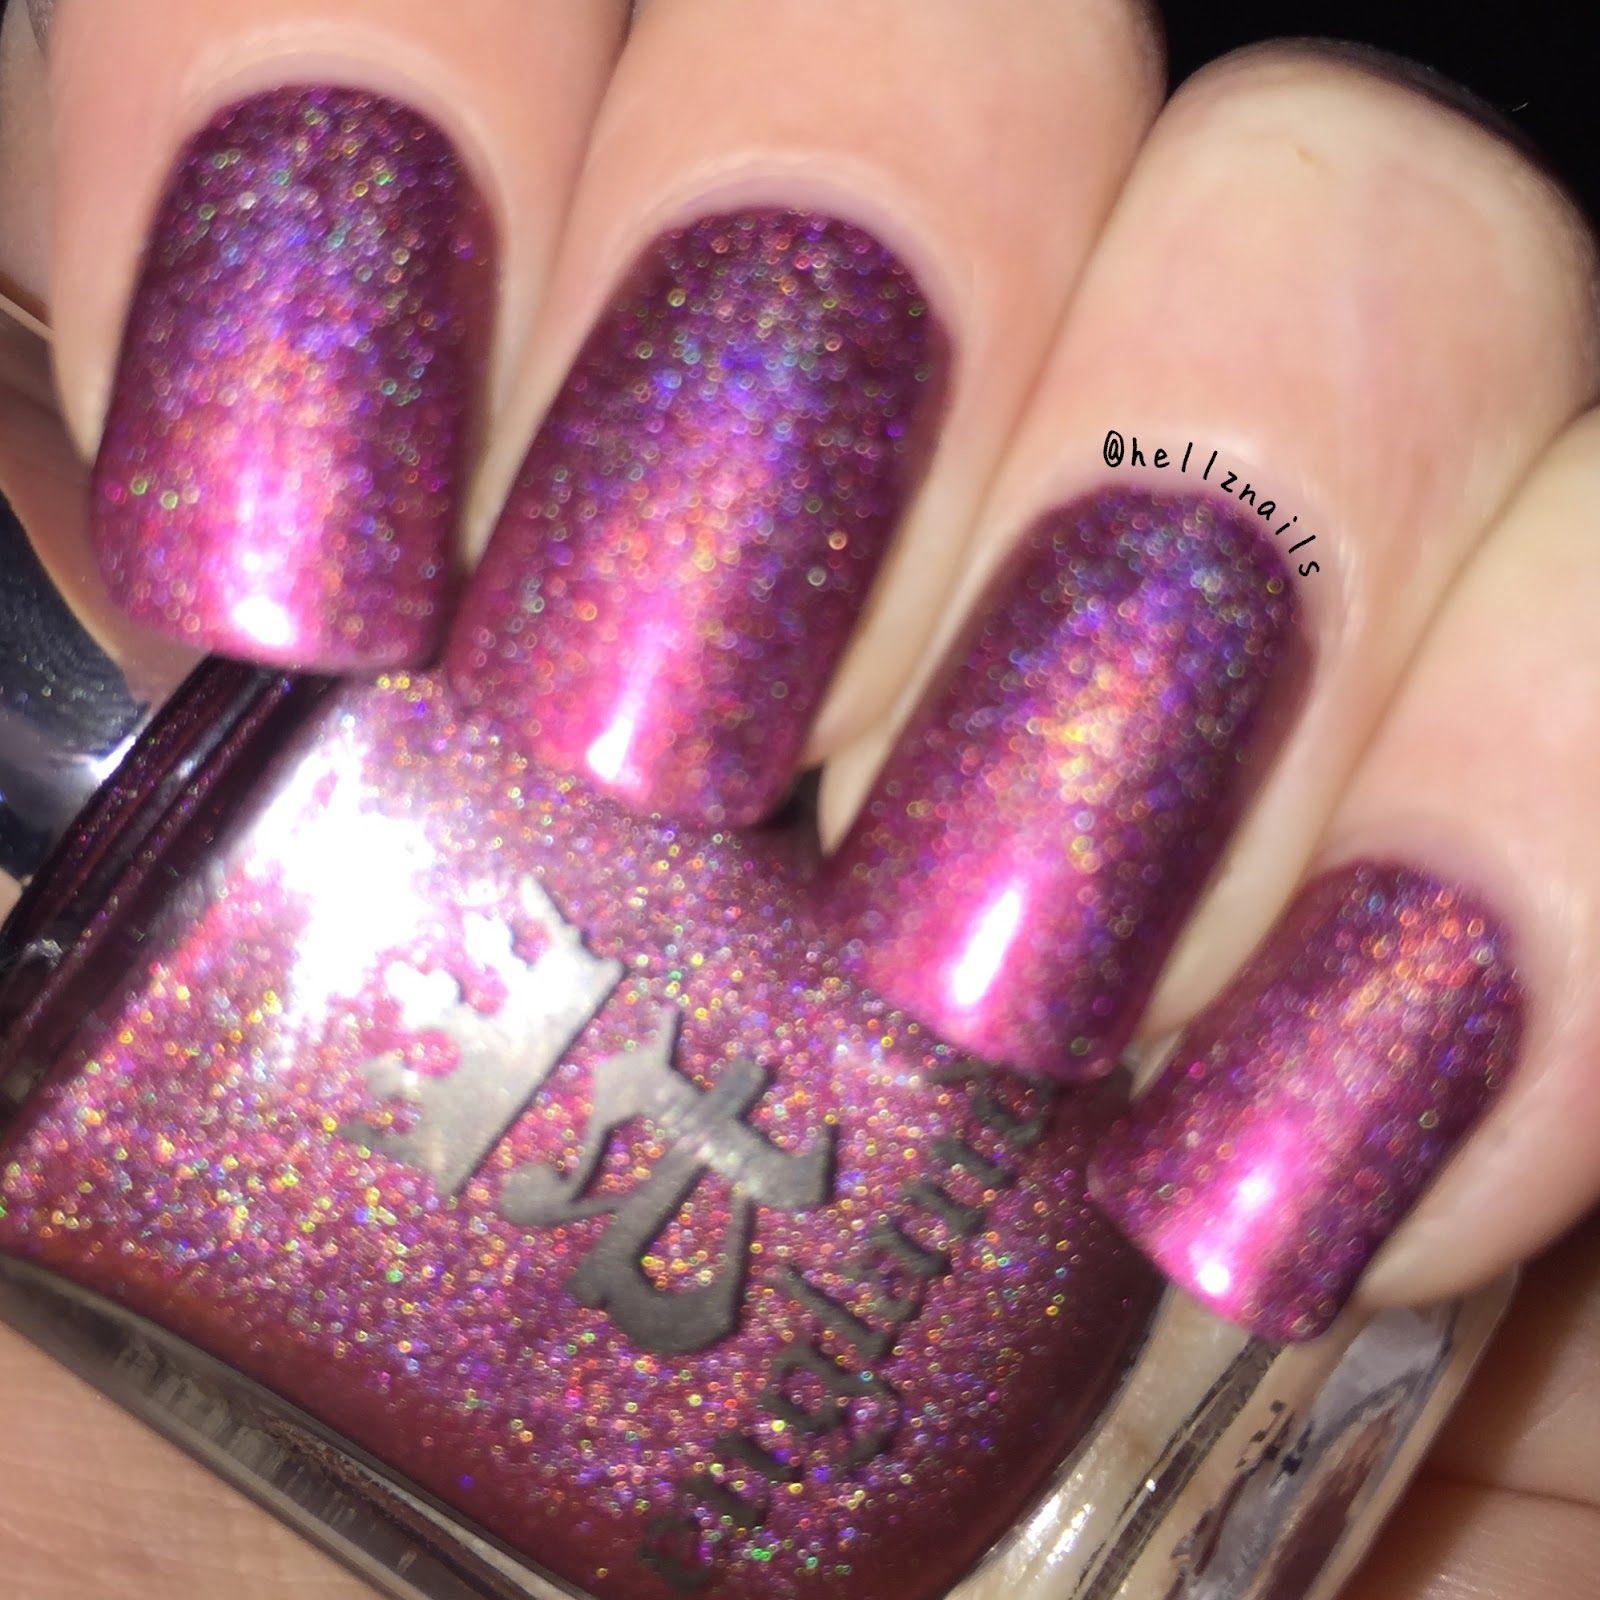 Sleeping Beauty Nails: A-England Briar Rose / Sleeping Beauty Nail Polish Swatch